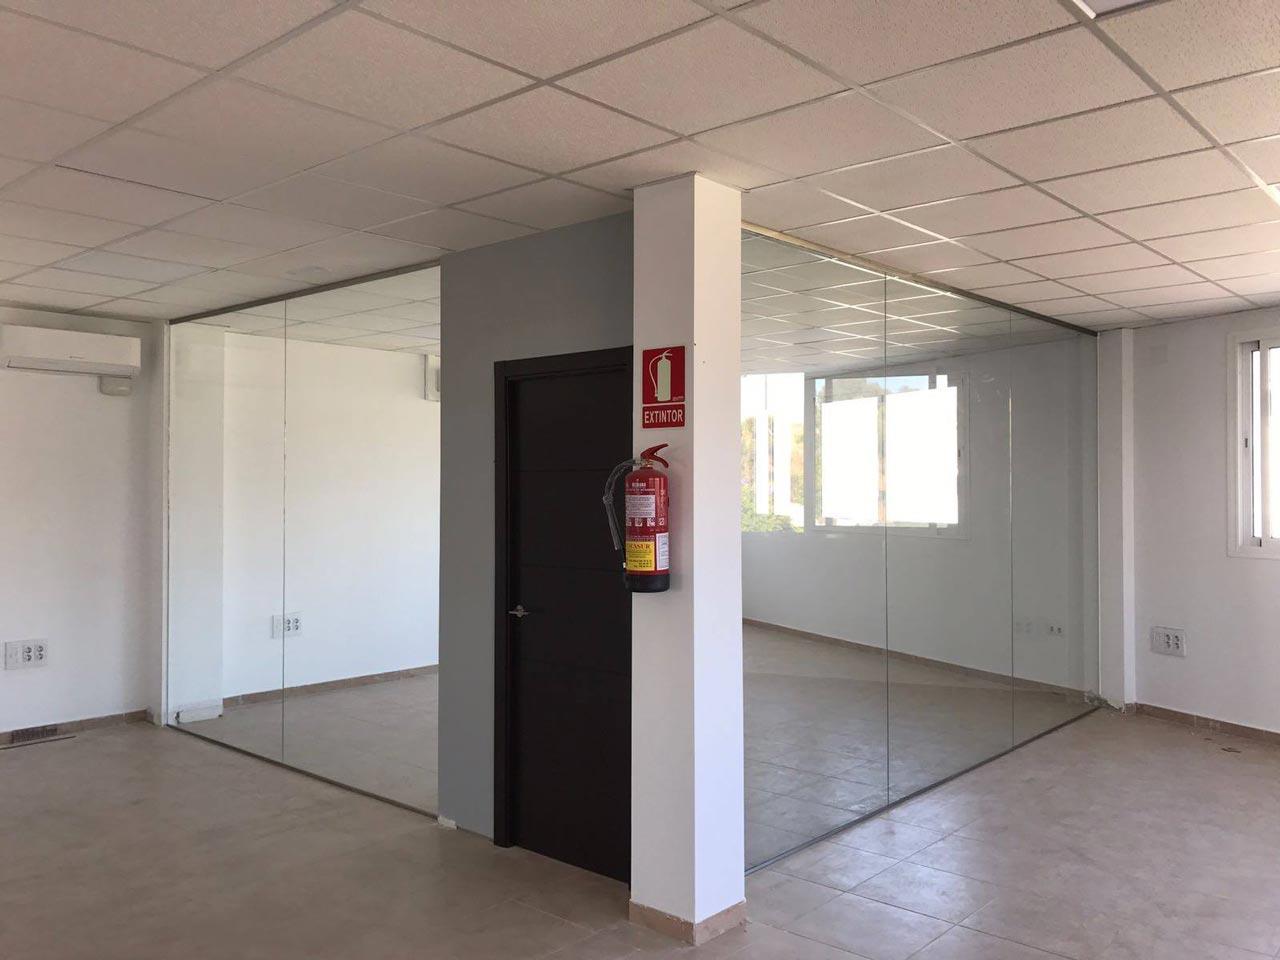 Cortinas de cristal para separar oficinas